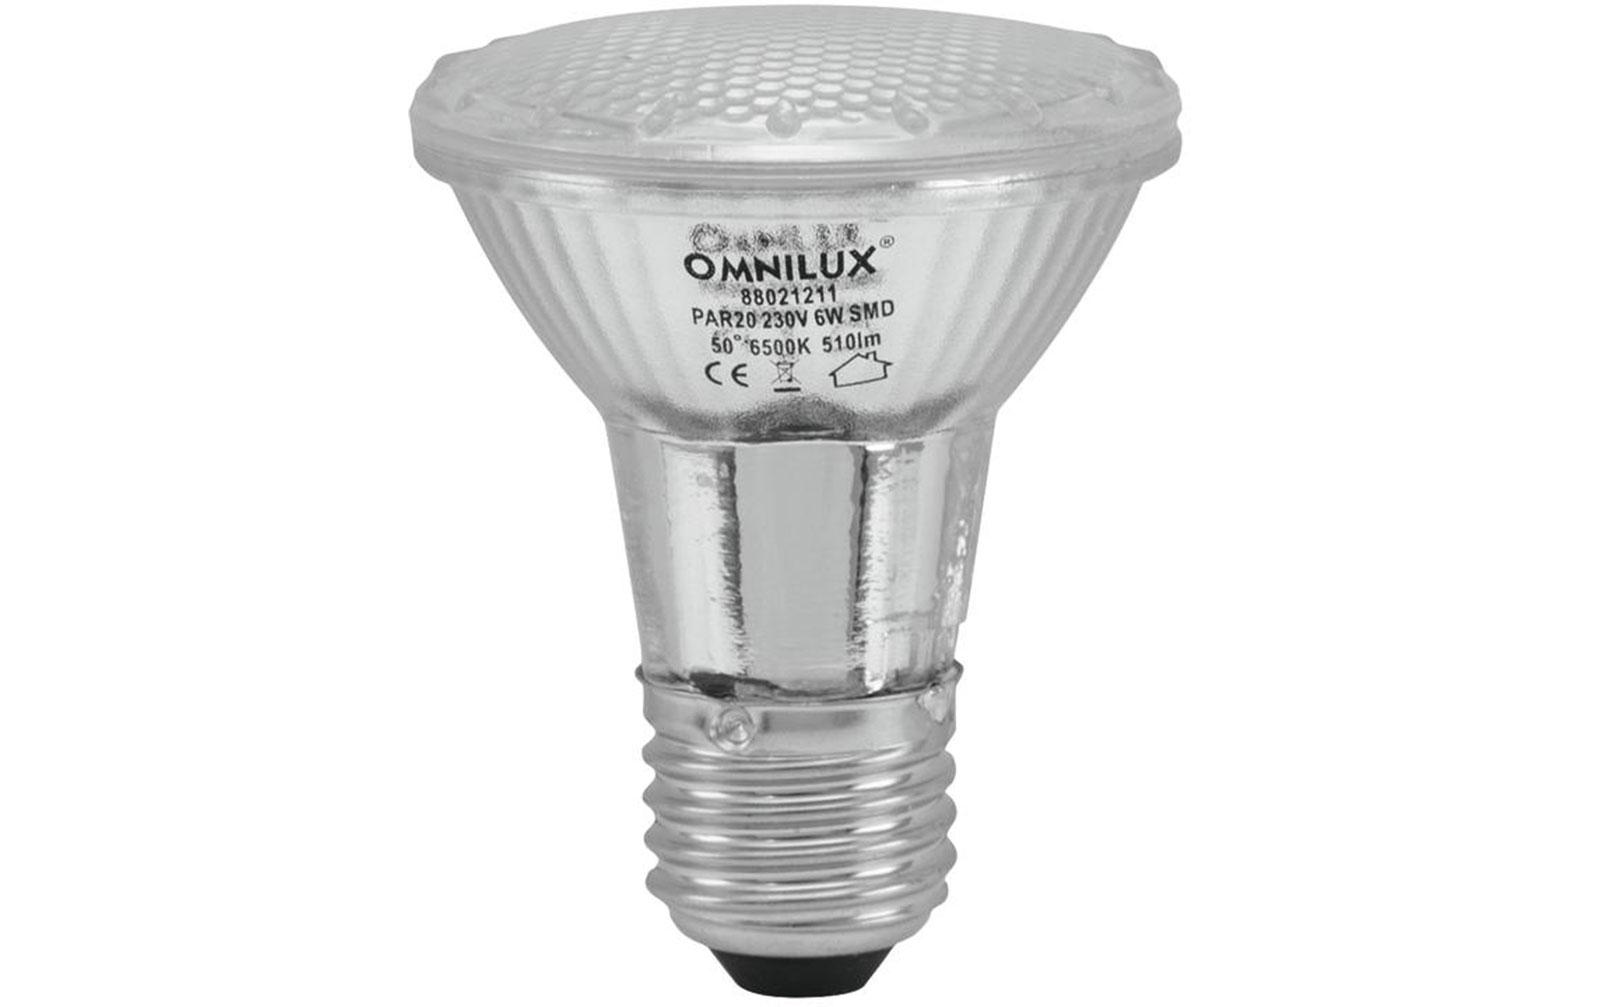 omnilux-par-20-230v-smd-6w-e-27-led-6500k